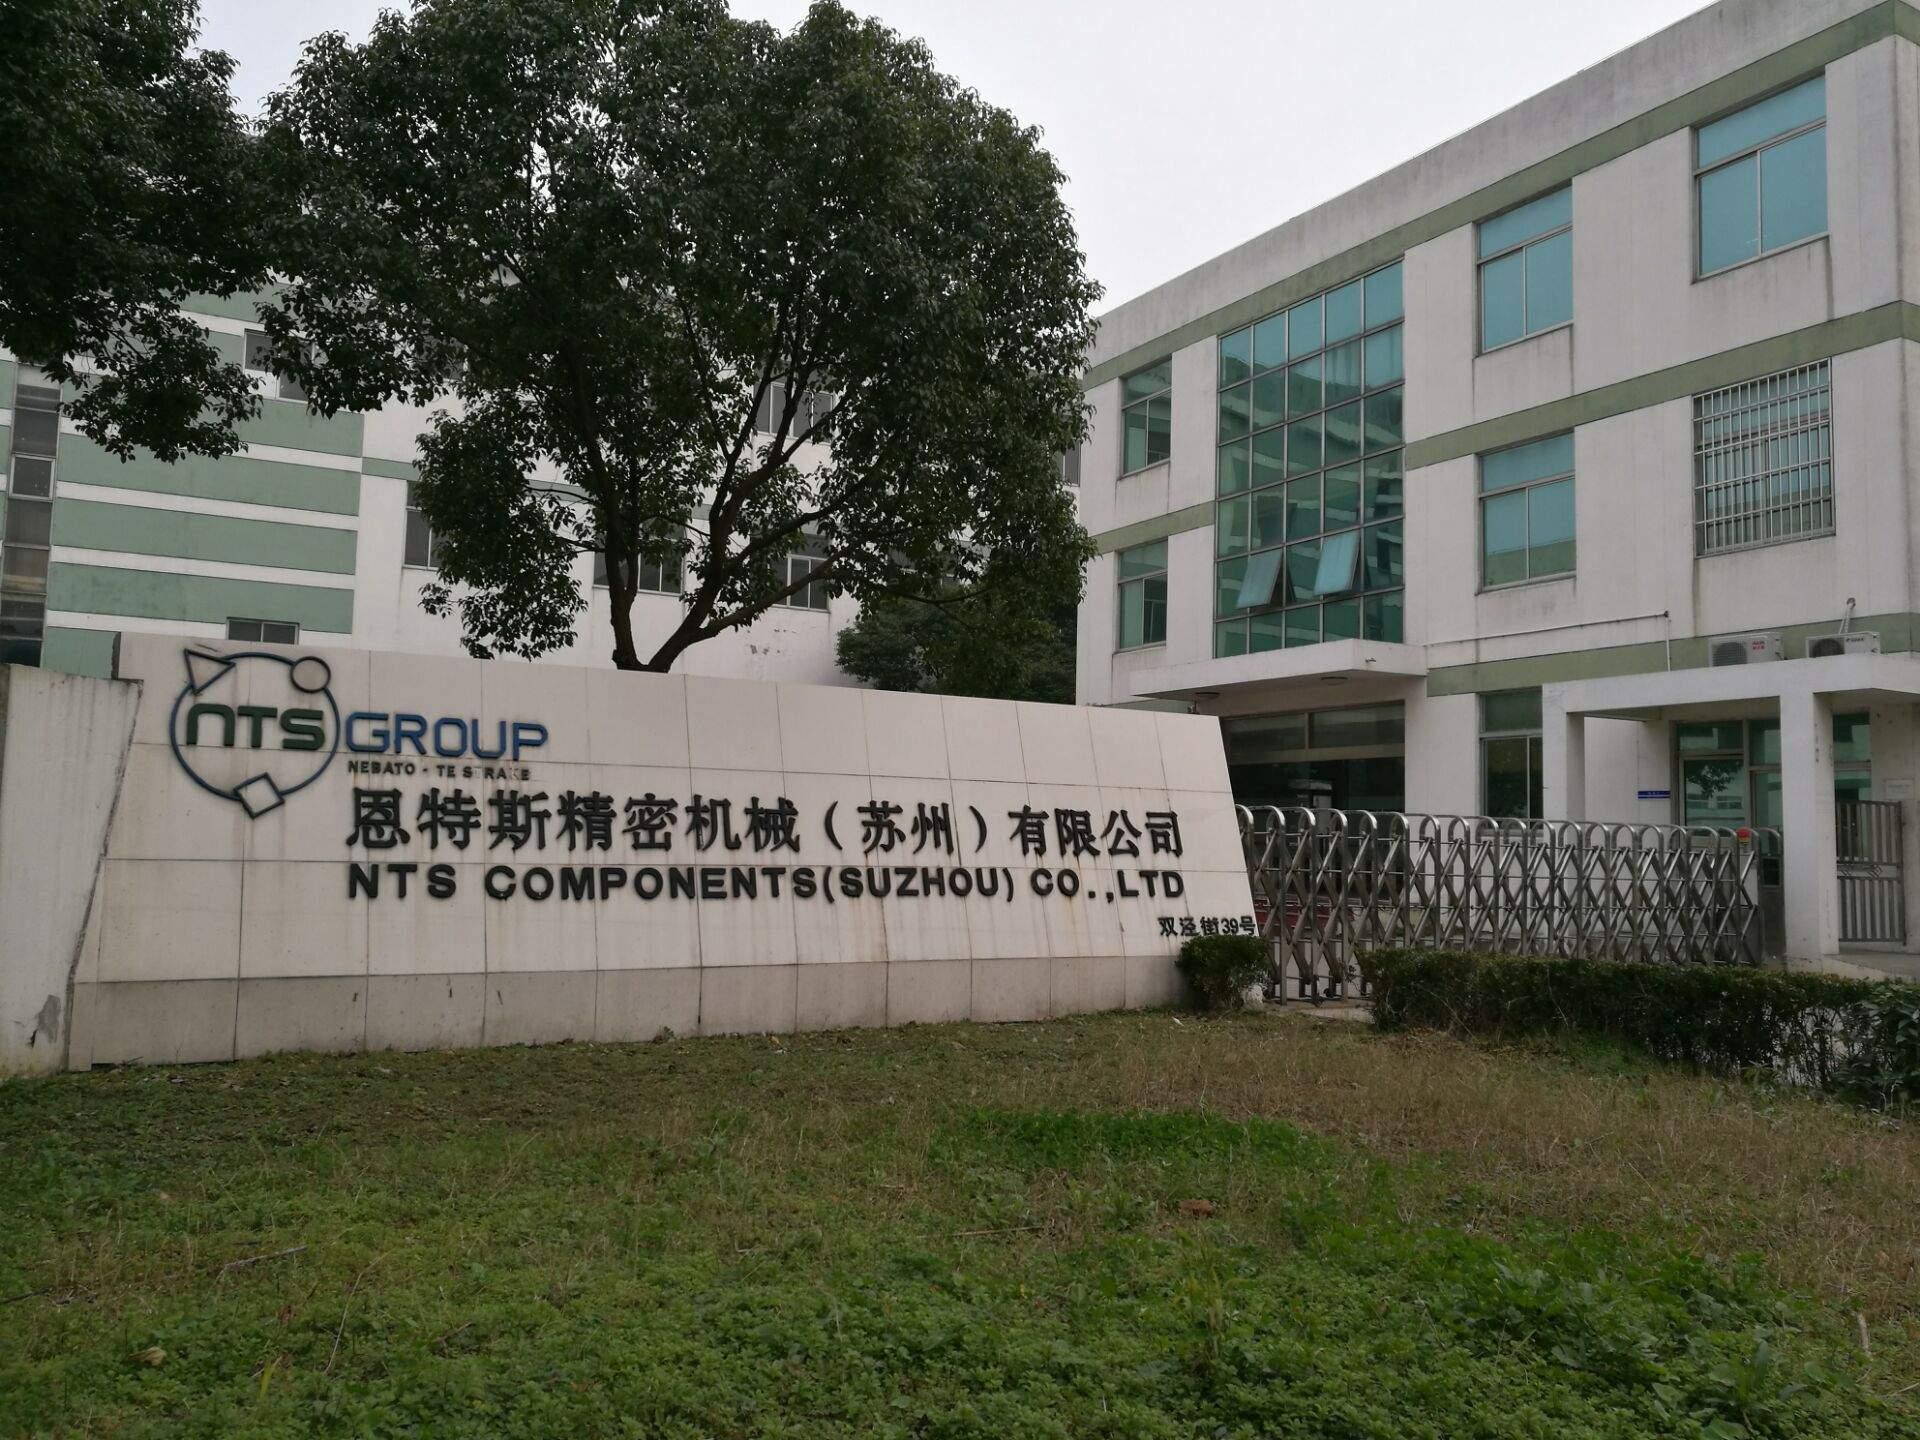 NTS Components Suzhou